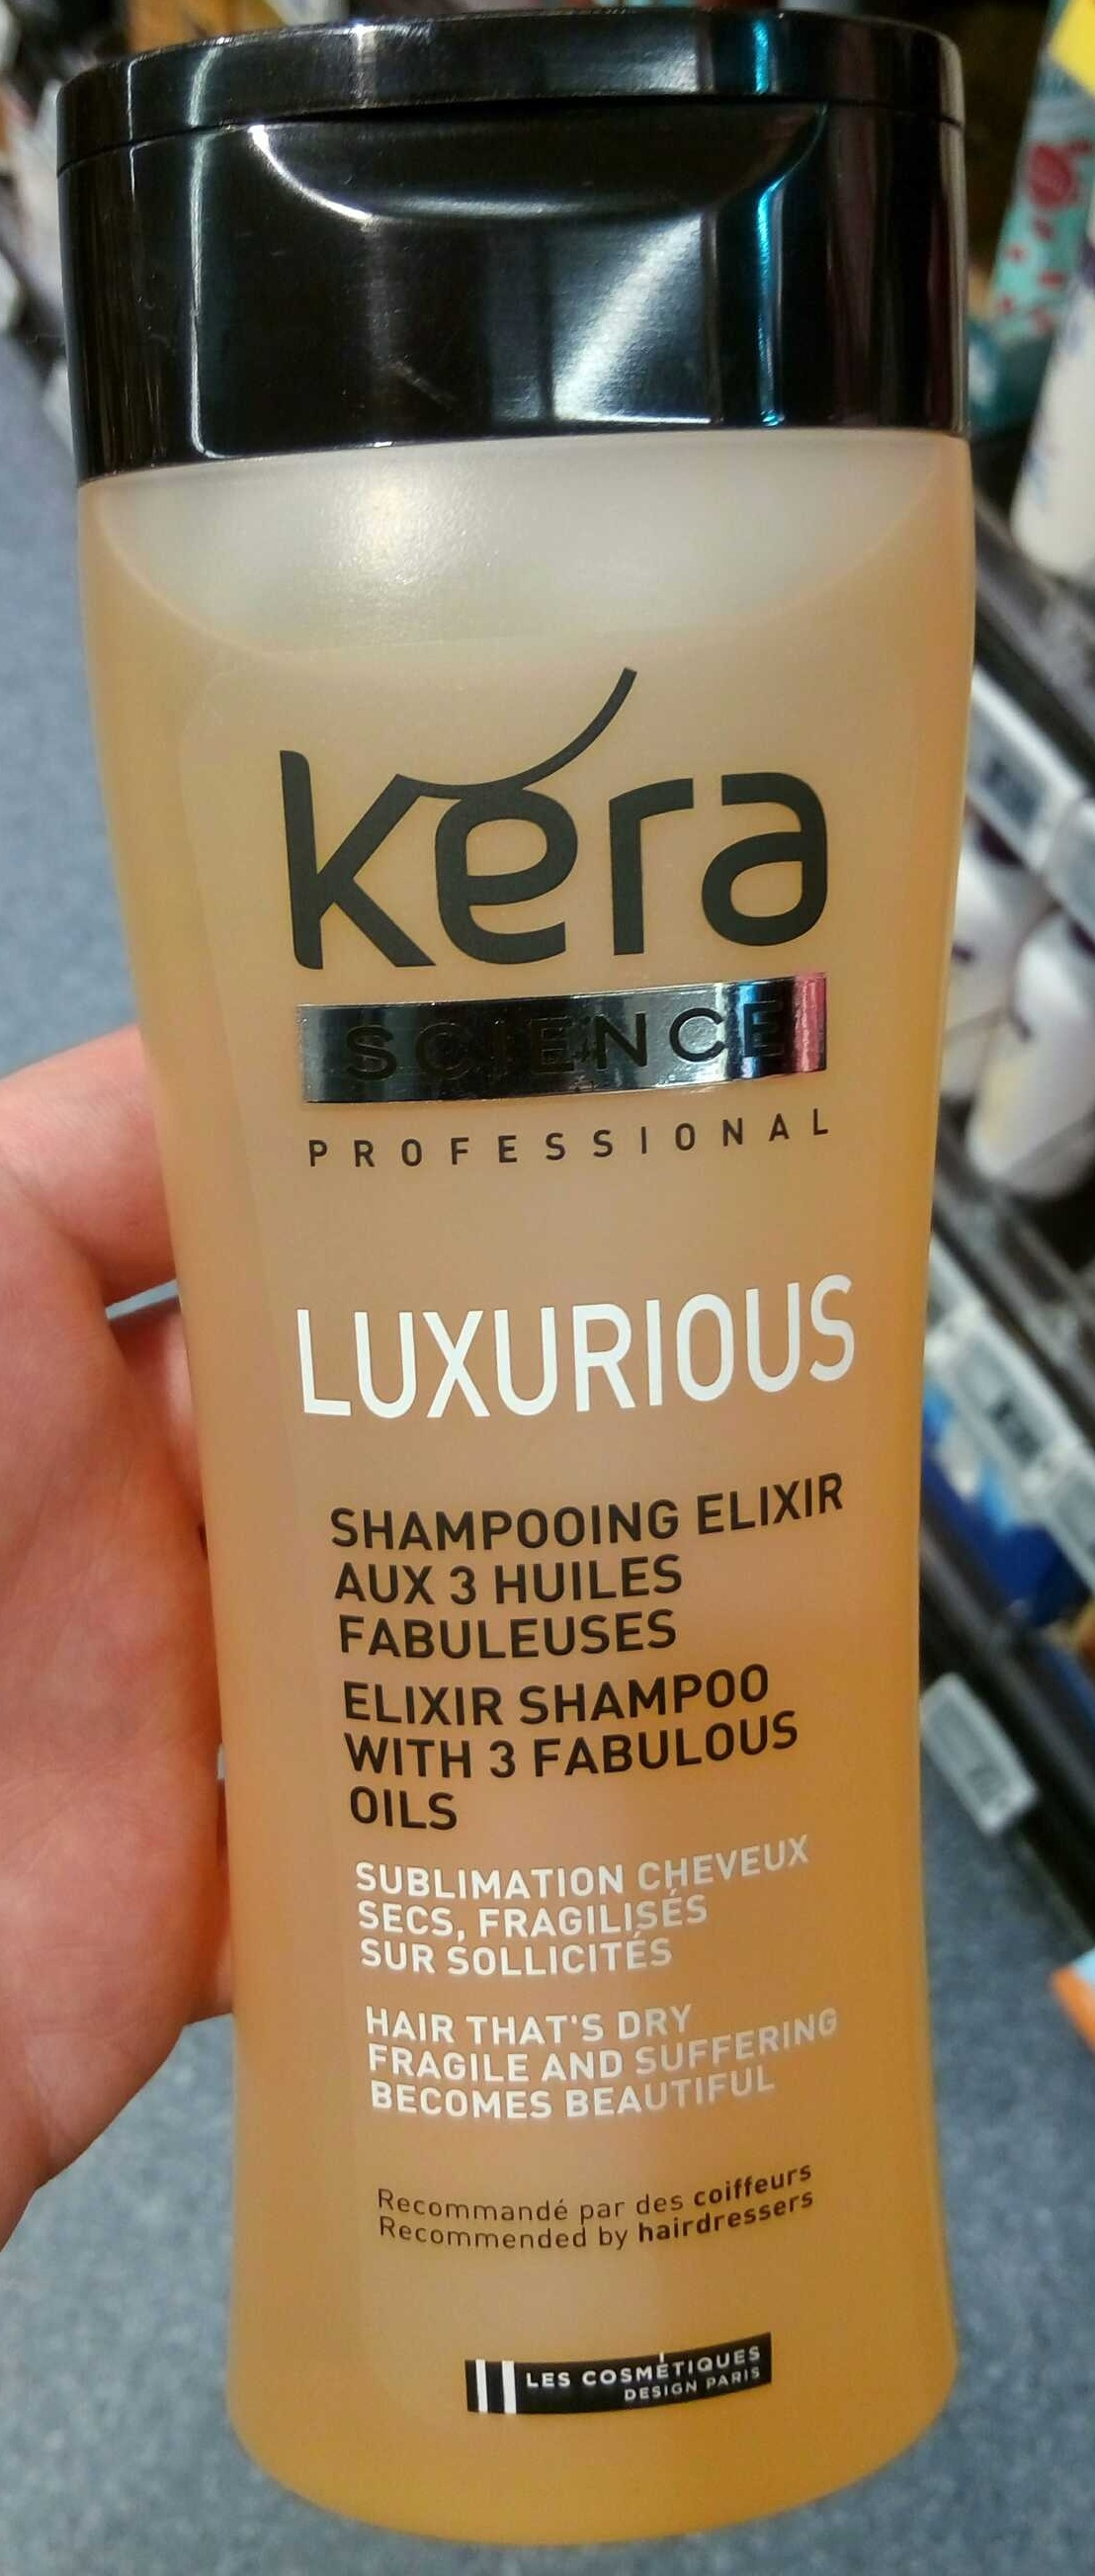 Luxurious Shampooing elixir aux 3 huiles fabuleuses - Product